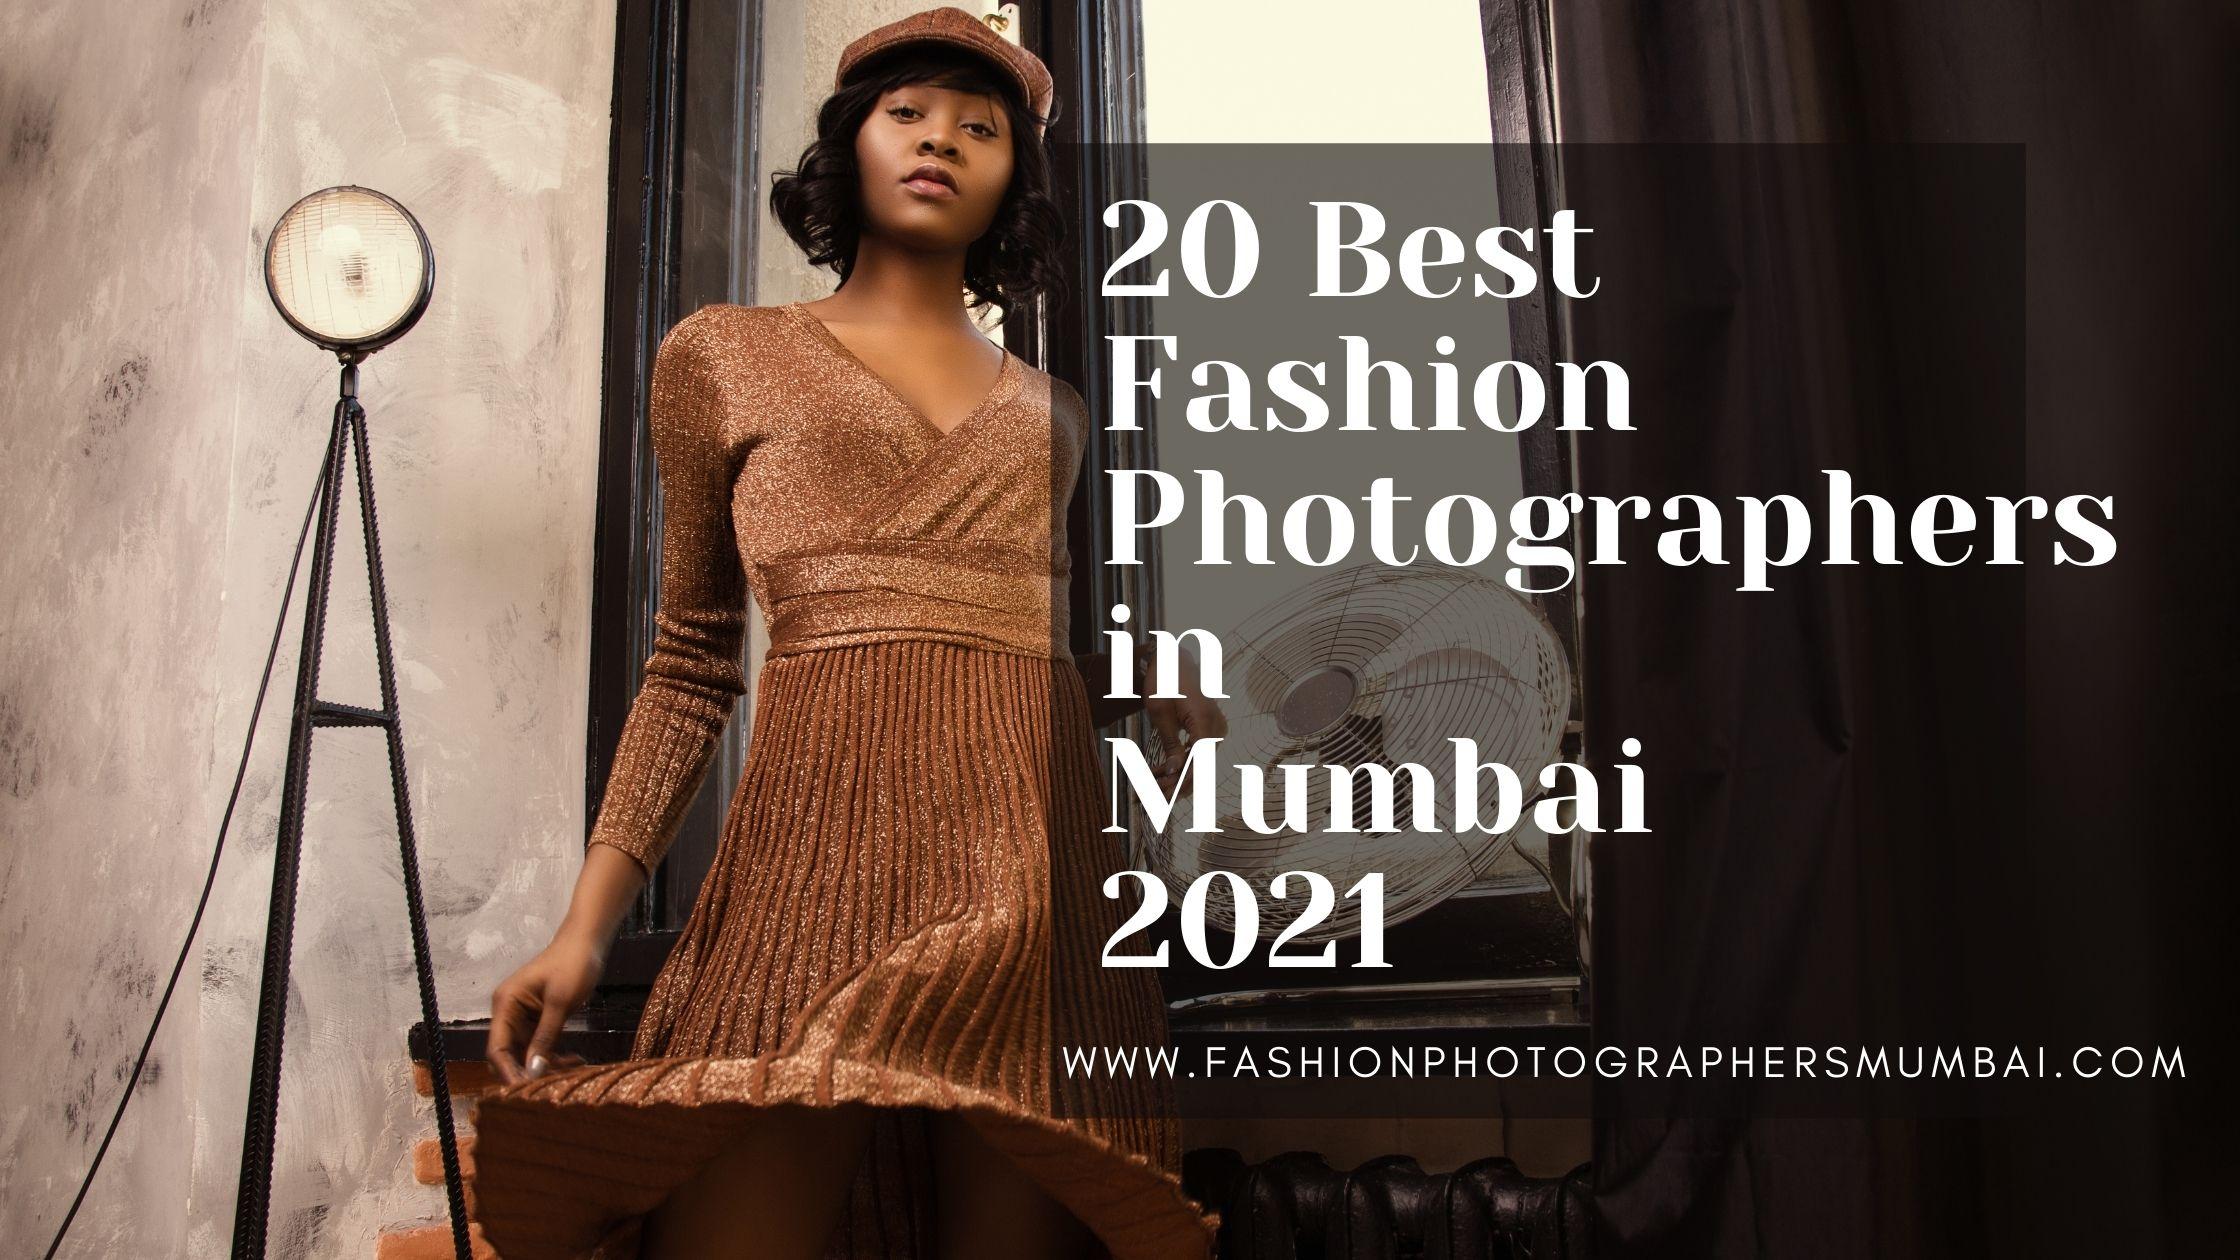 20 Best Fashion Photographers in Mumbai in 2021